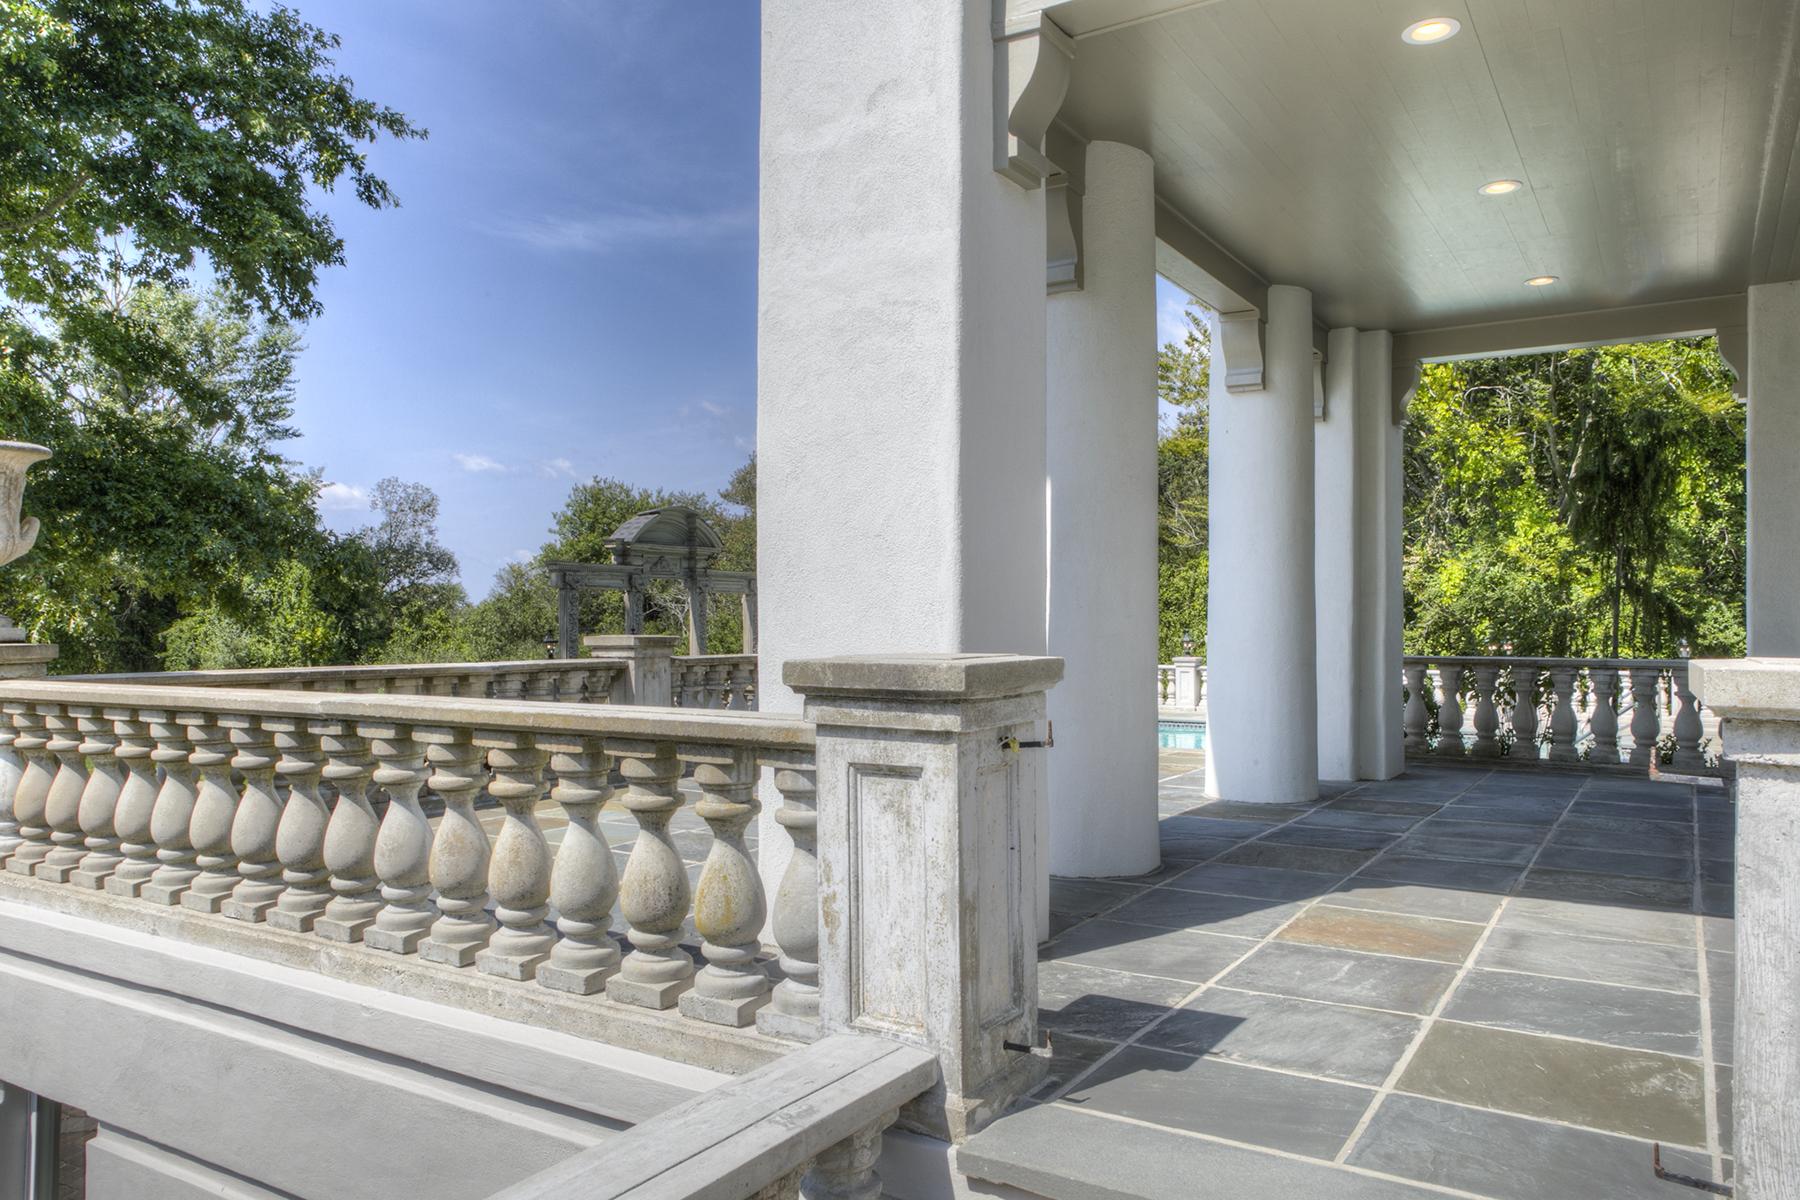 Additional photo for property listing at Casa del Sole 63 Hammersmith Road 纽波特, 罗得岛 02840 美国